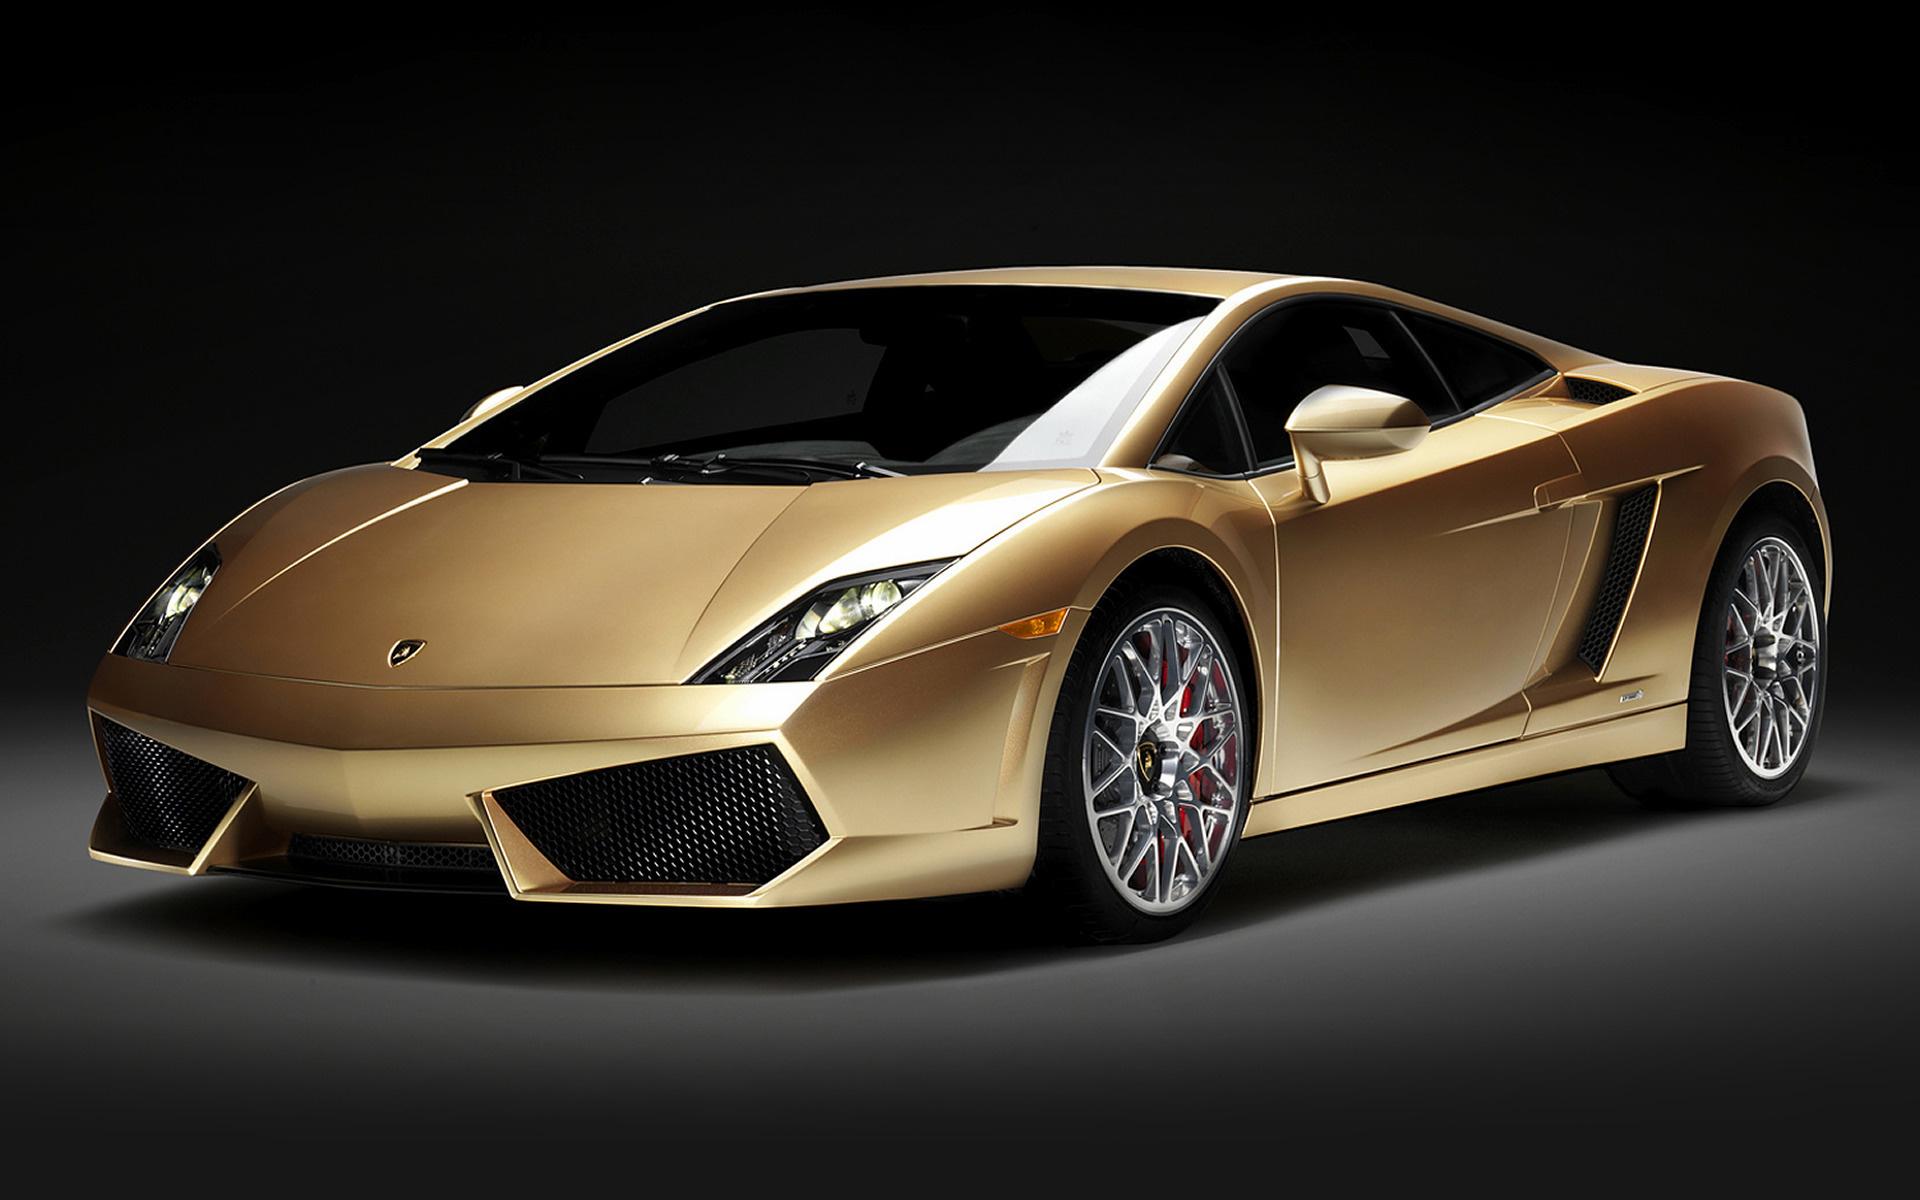 Sport Hyundai Dodge >> 2012 Lamborghini Gallardo LP 560-4 Gold Edition (CN ...